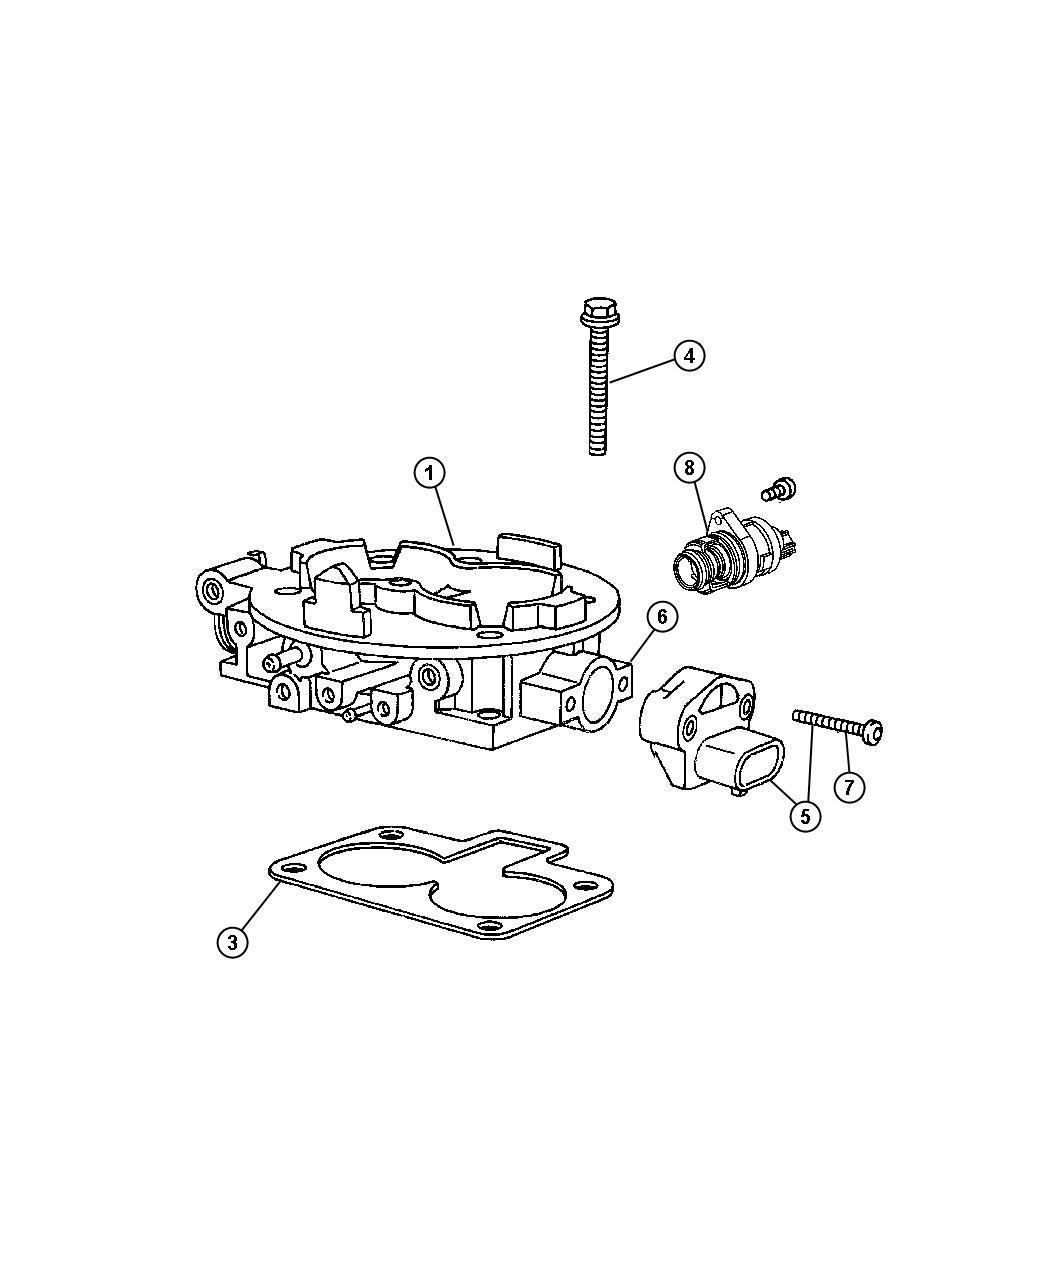 05114397AA  Jeep    Throttle       body      Mopar Parts Overstock